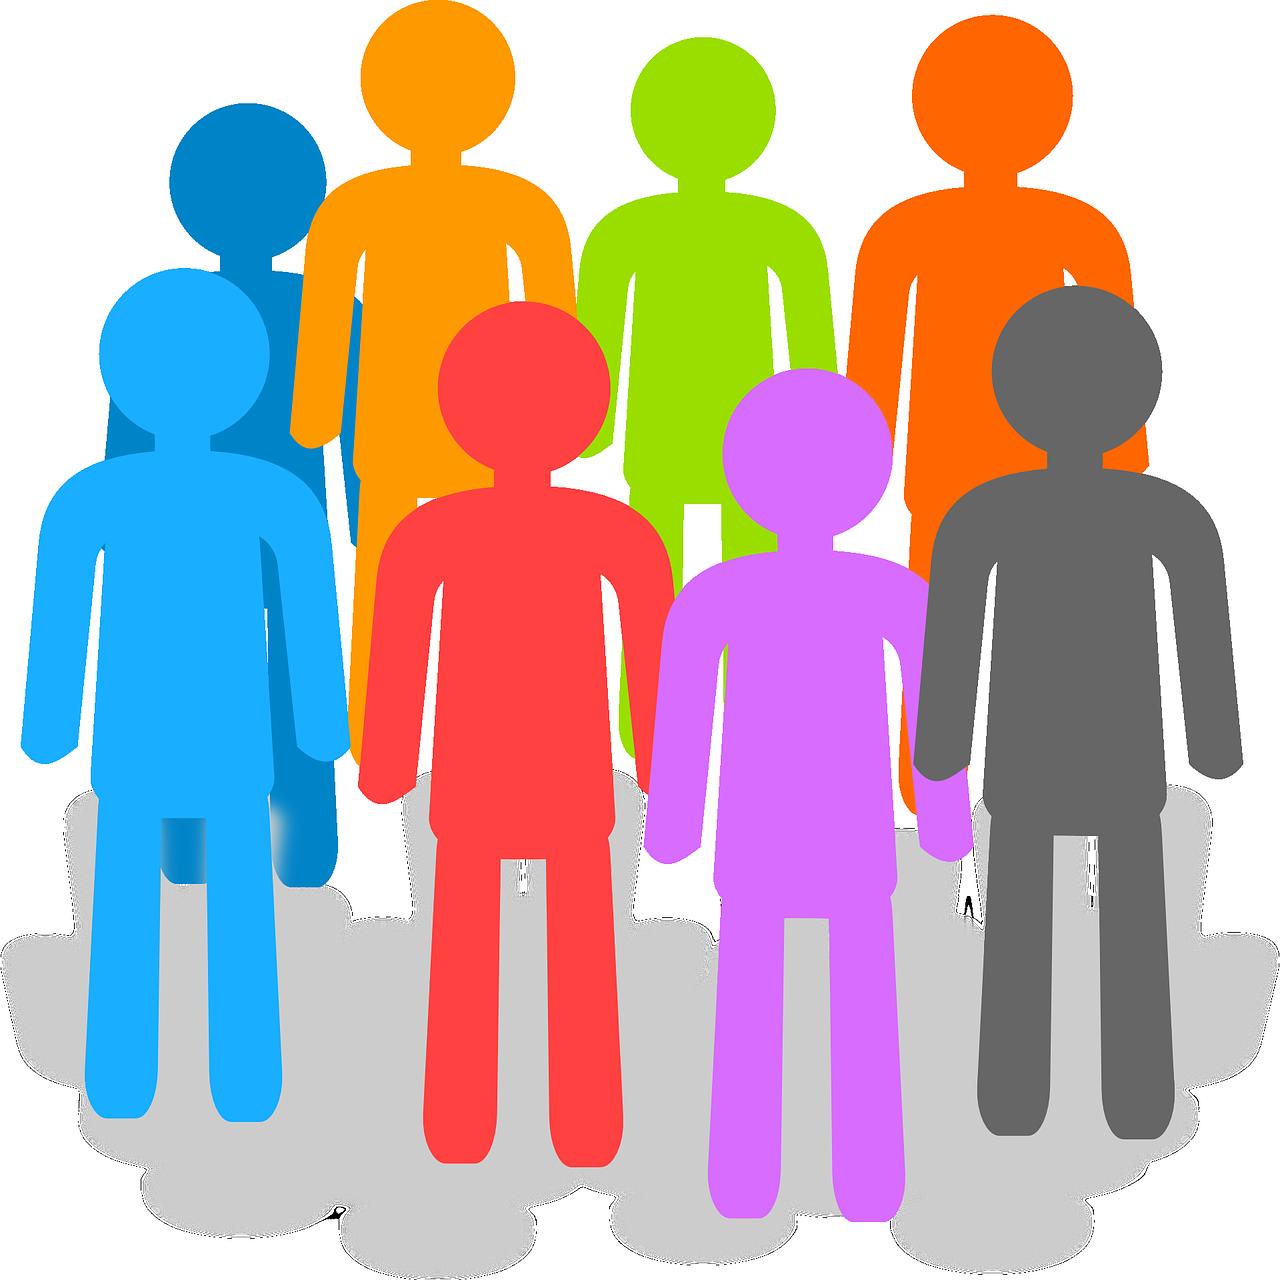 pixabay-ccpublicdomain-association-152746_1280